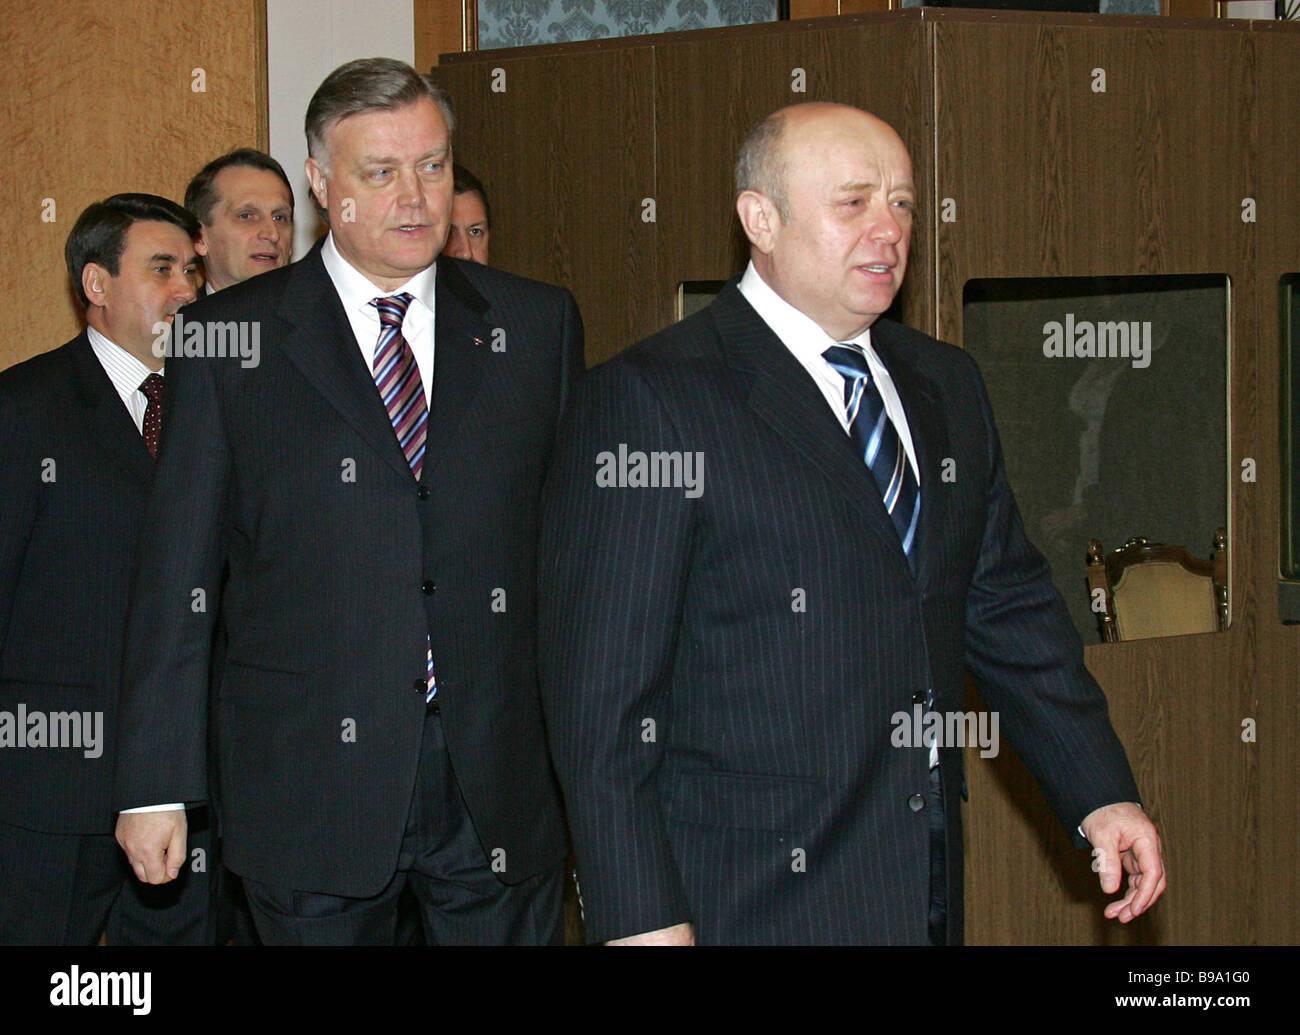 https://c8.alamy.com/comp/B9A1G0/vladimir-yakunin-president-of-company-russian-railways-and-russian-B9A1G0.jpg